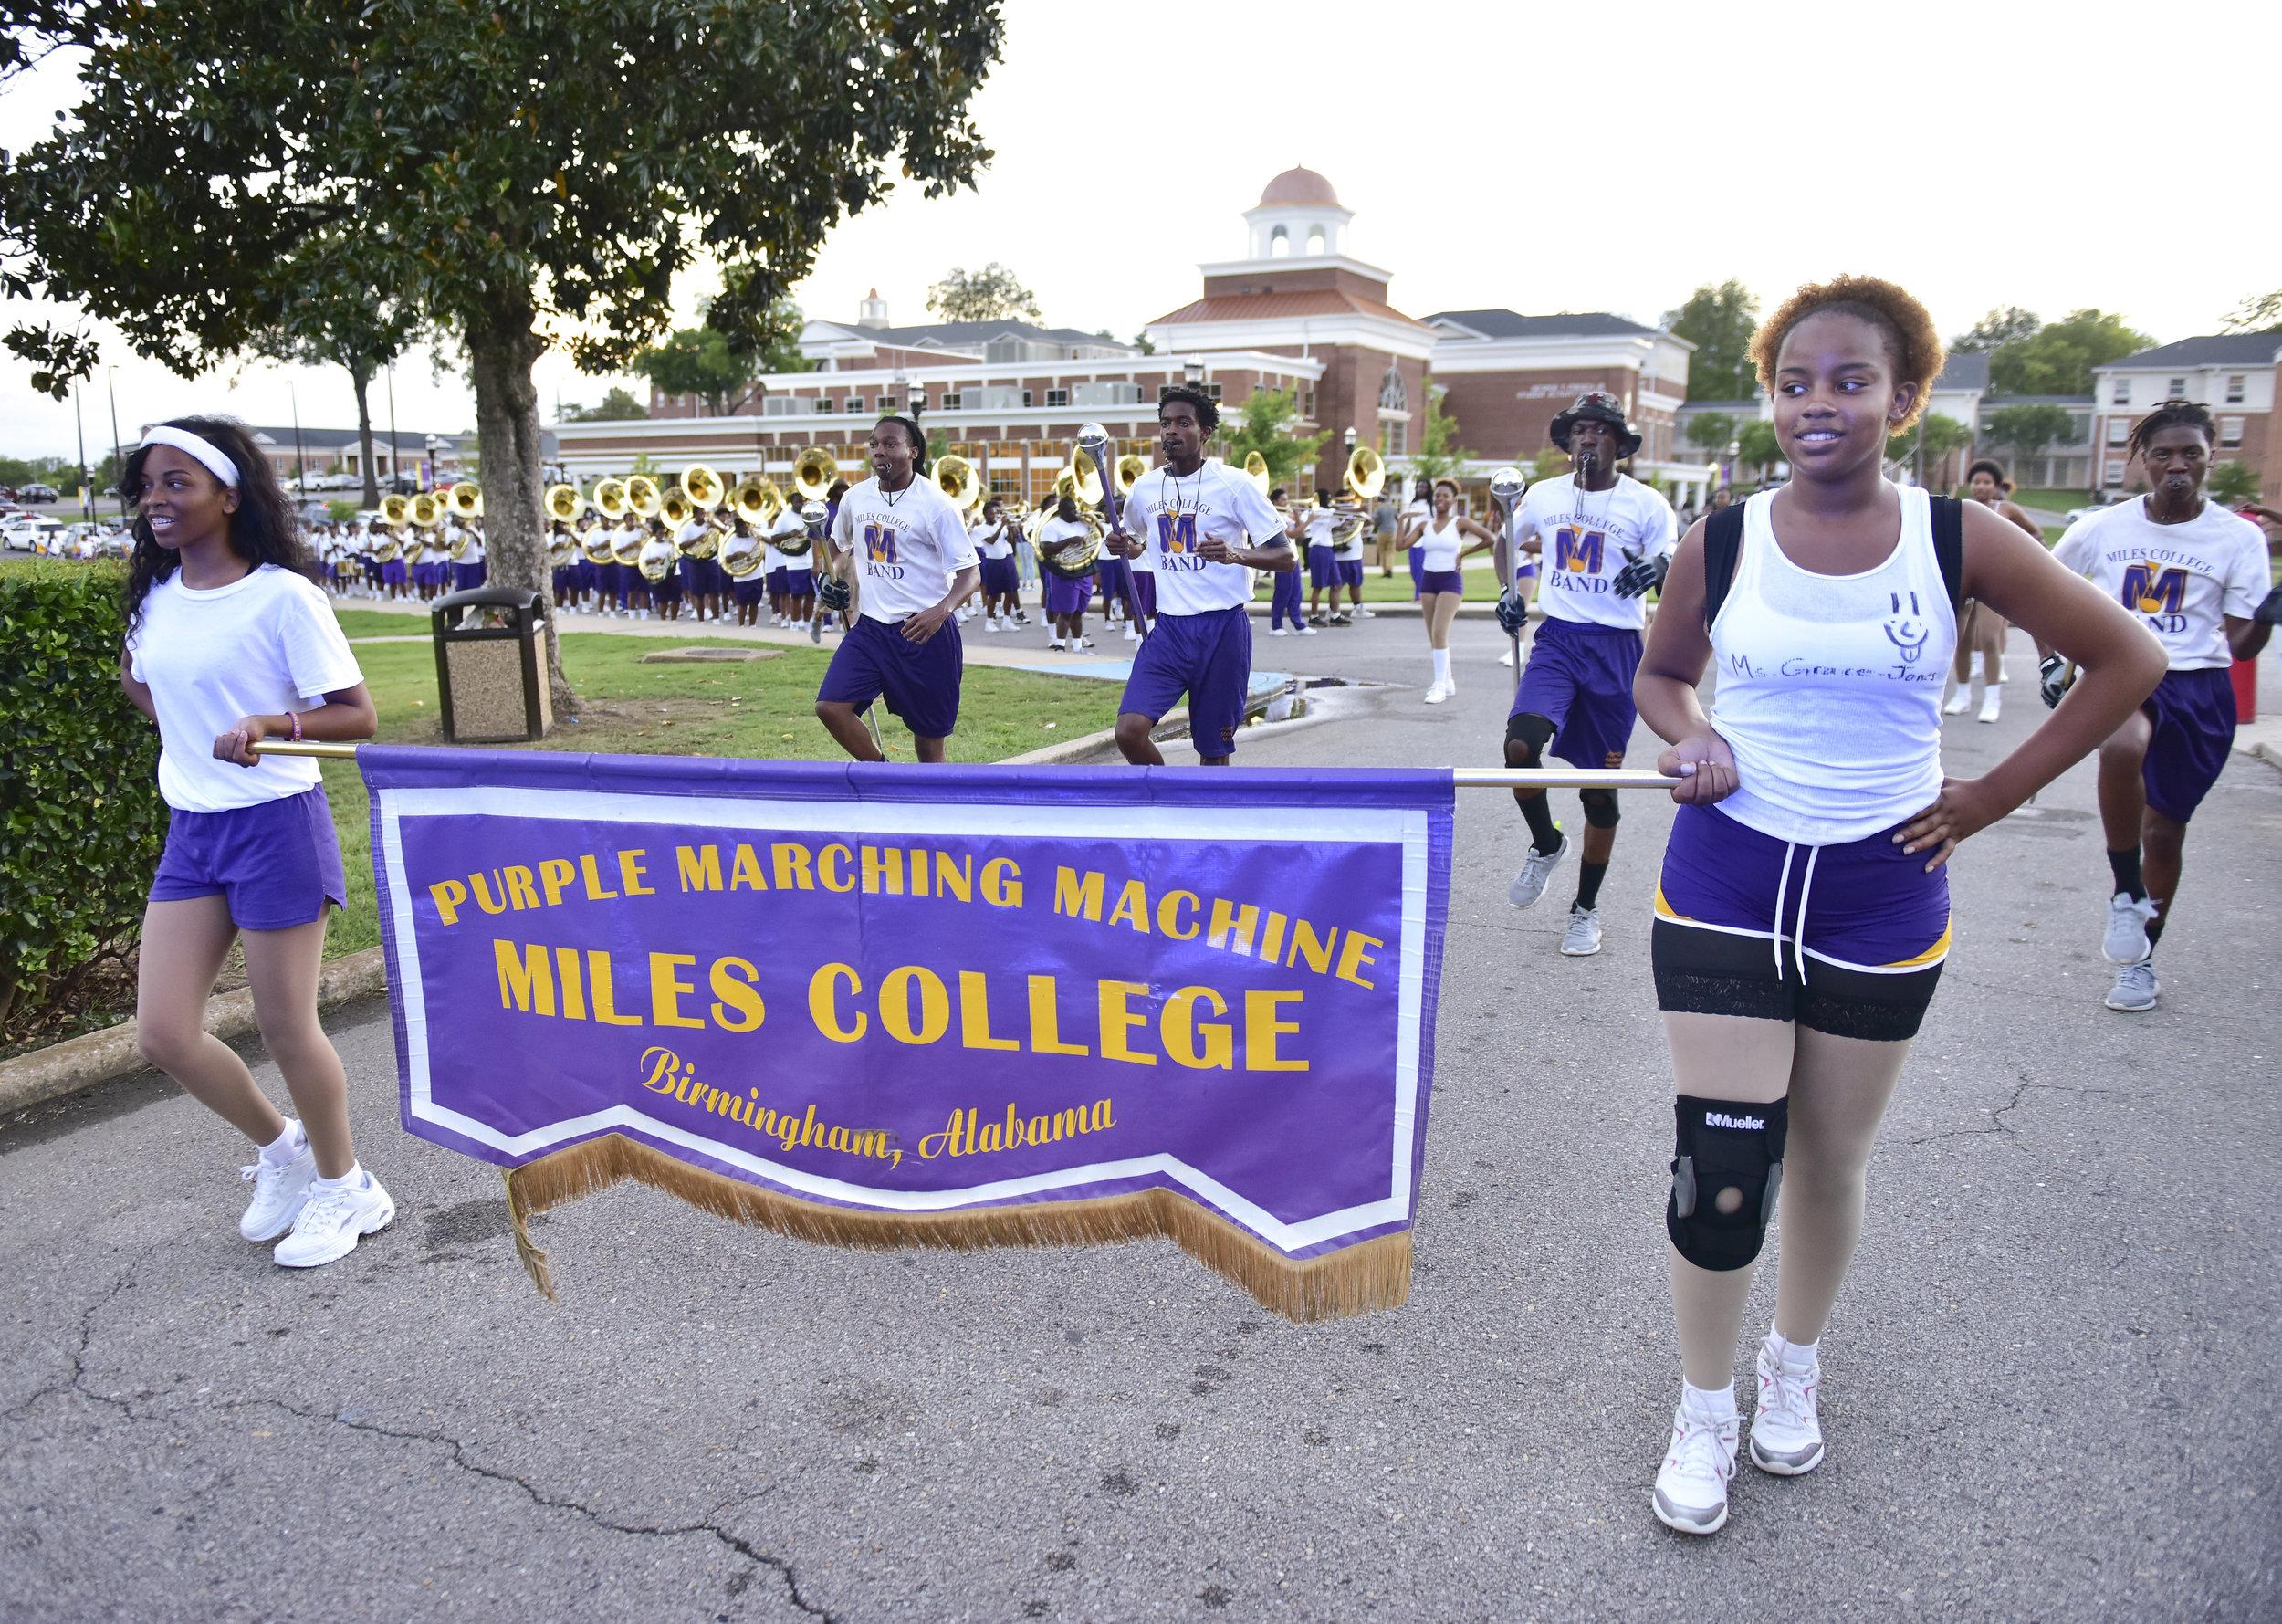 Miles-College-Marching-Purple-Machine_8A.jpg